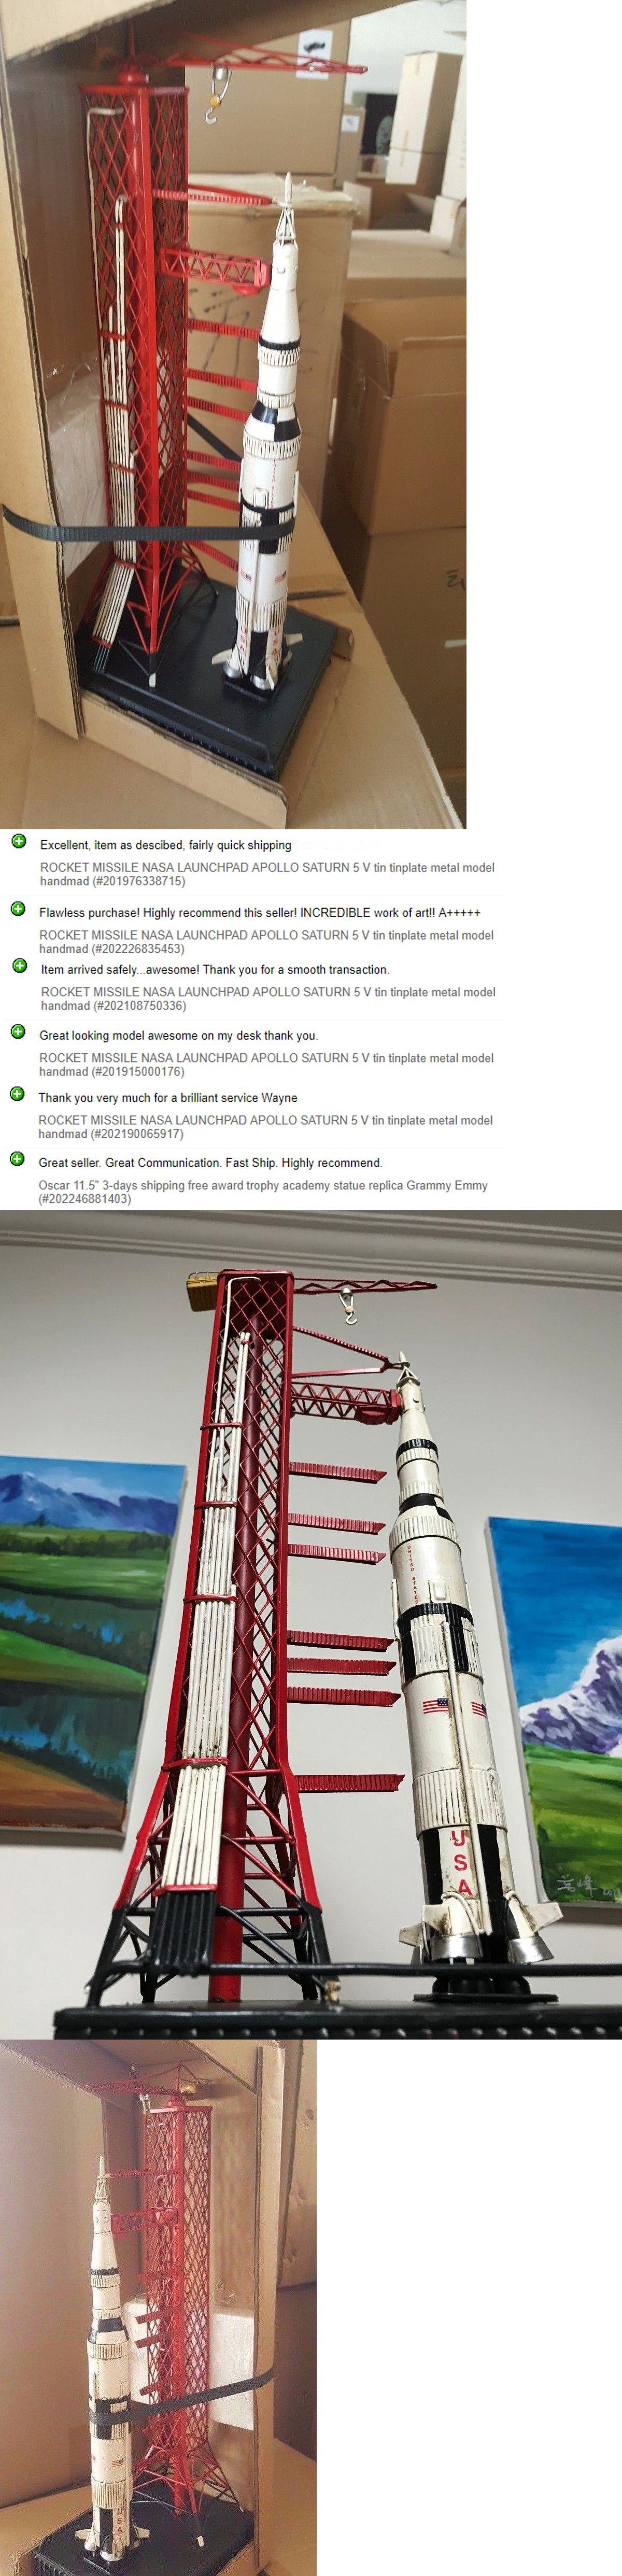 Rocket missile nasa launchpad apollo saturn v tin tinplate metal